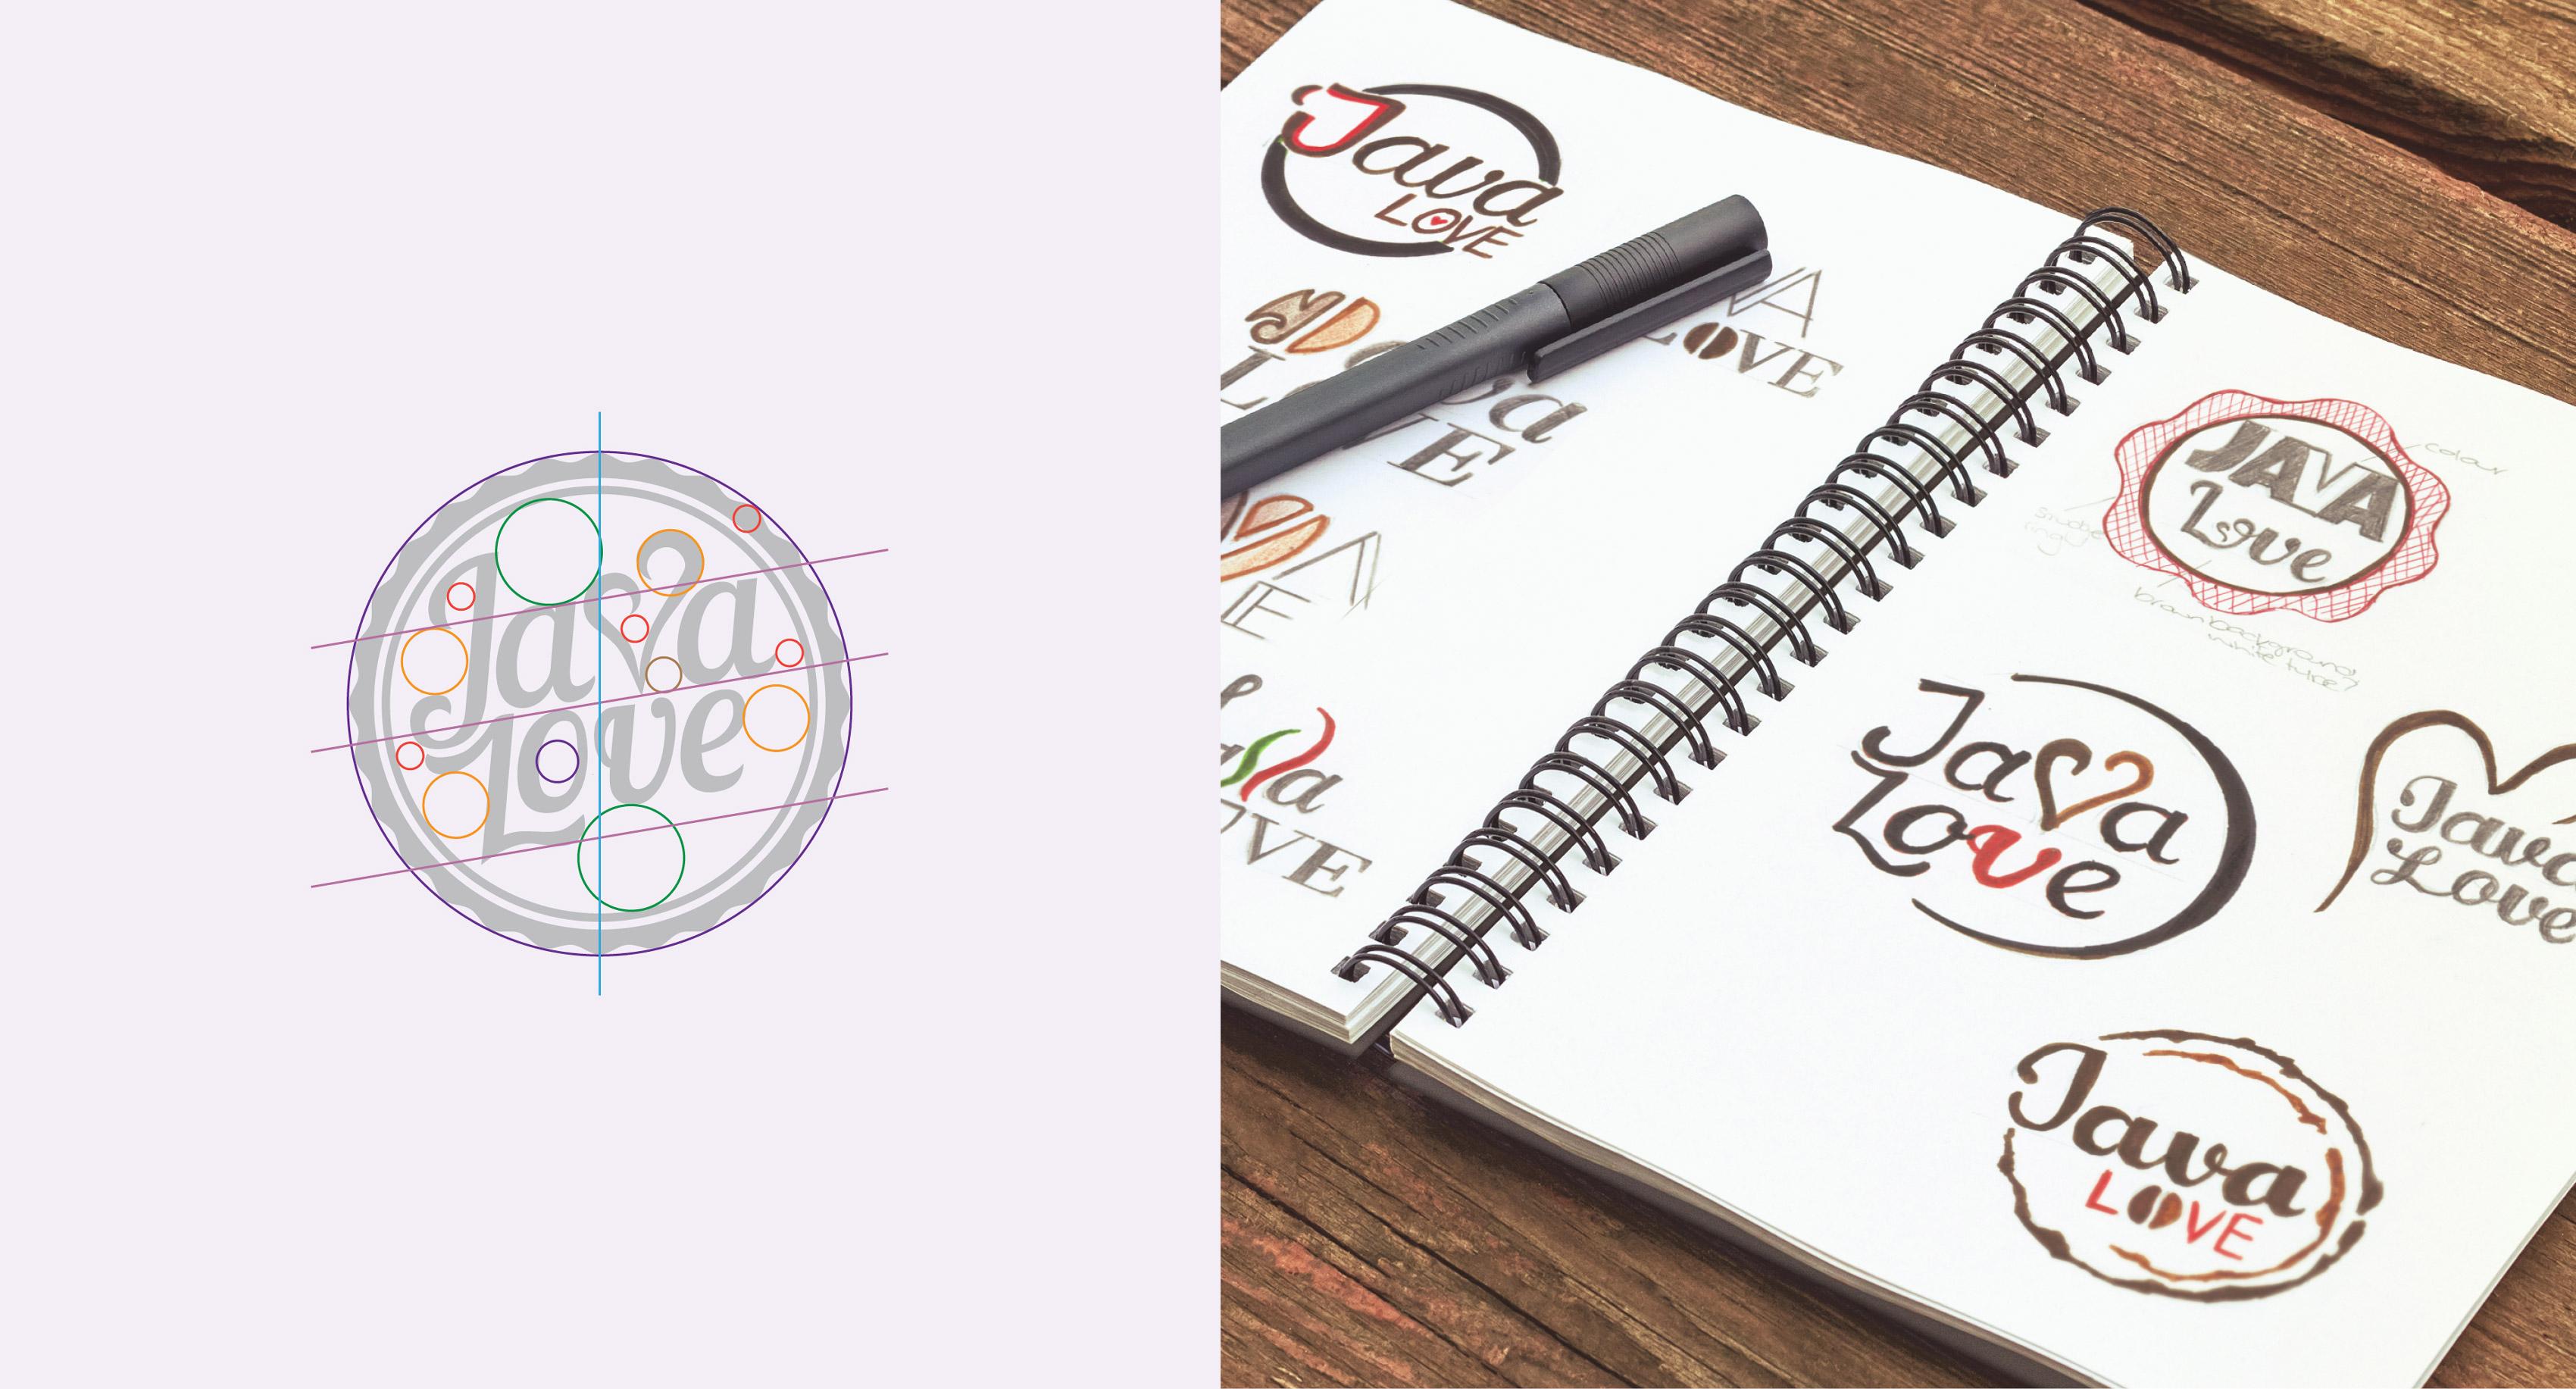 JavaLove-logo-concepts